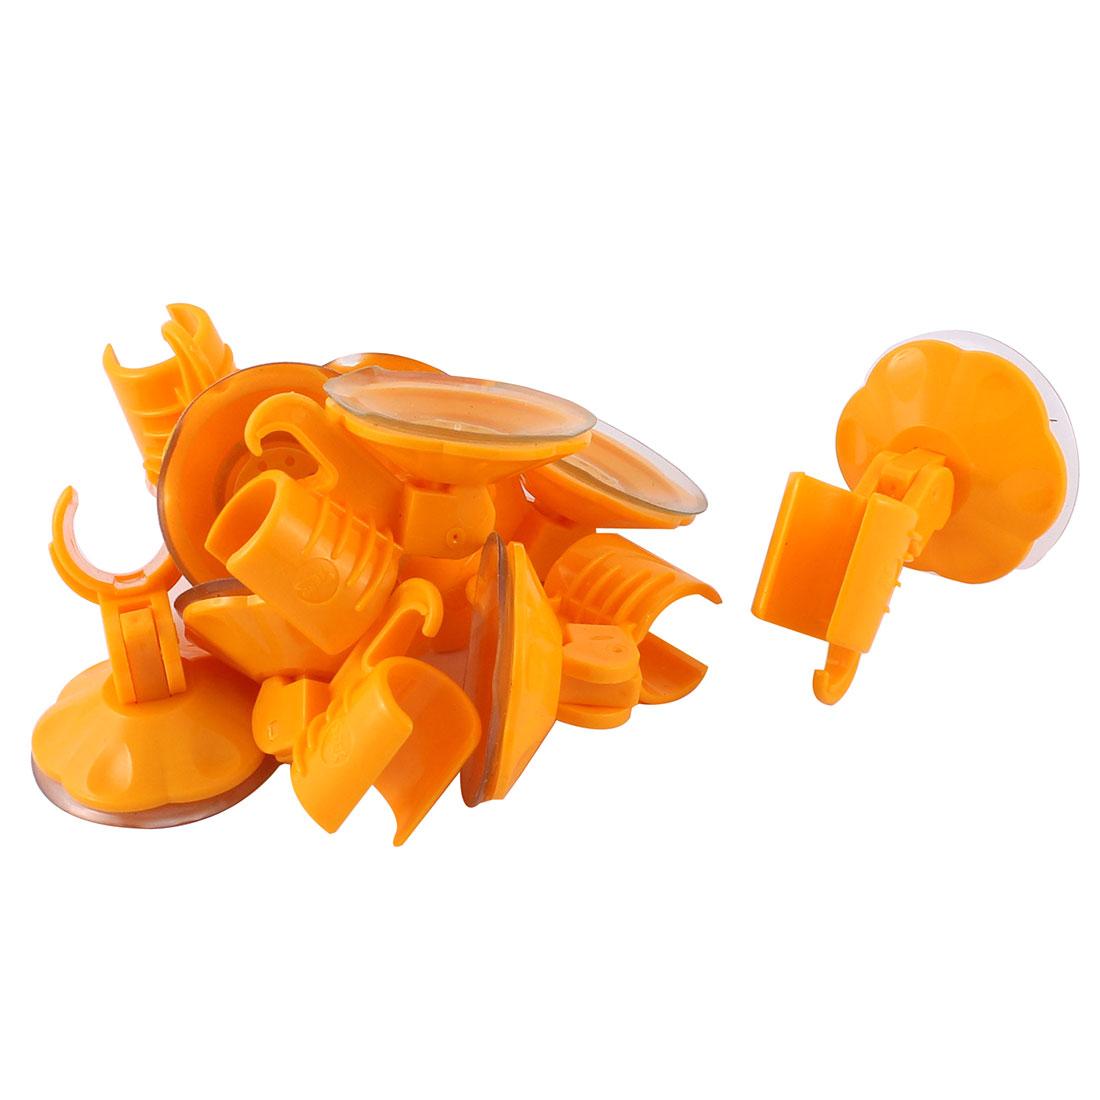 8pcs Attachable Bathroom Shower Head Holder Wall Suction Cup Bracket Orange